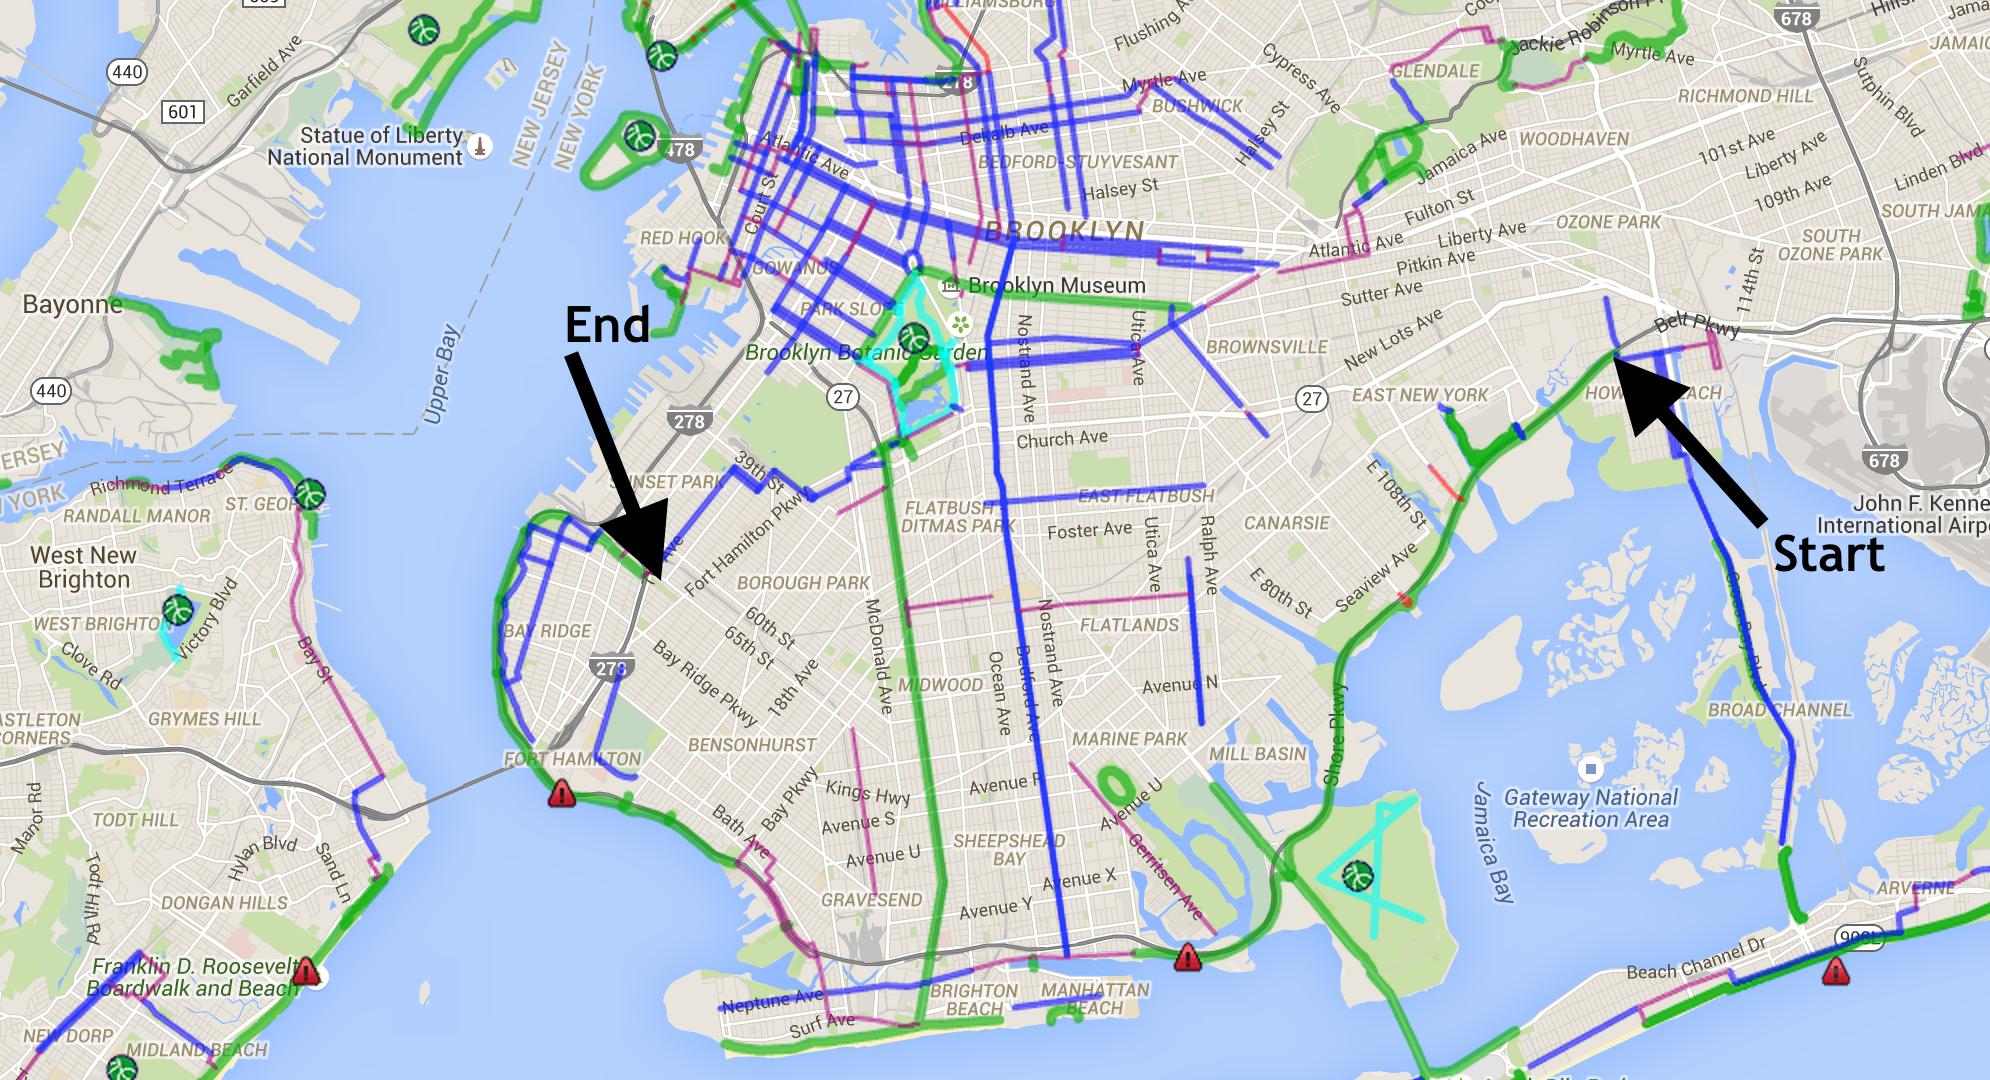 Bike map credit:    NYCBikeMaps.com